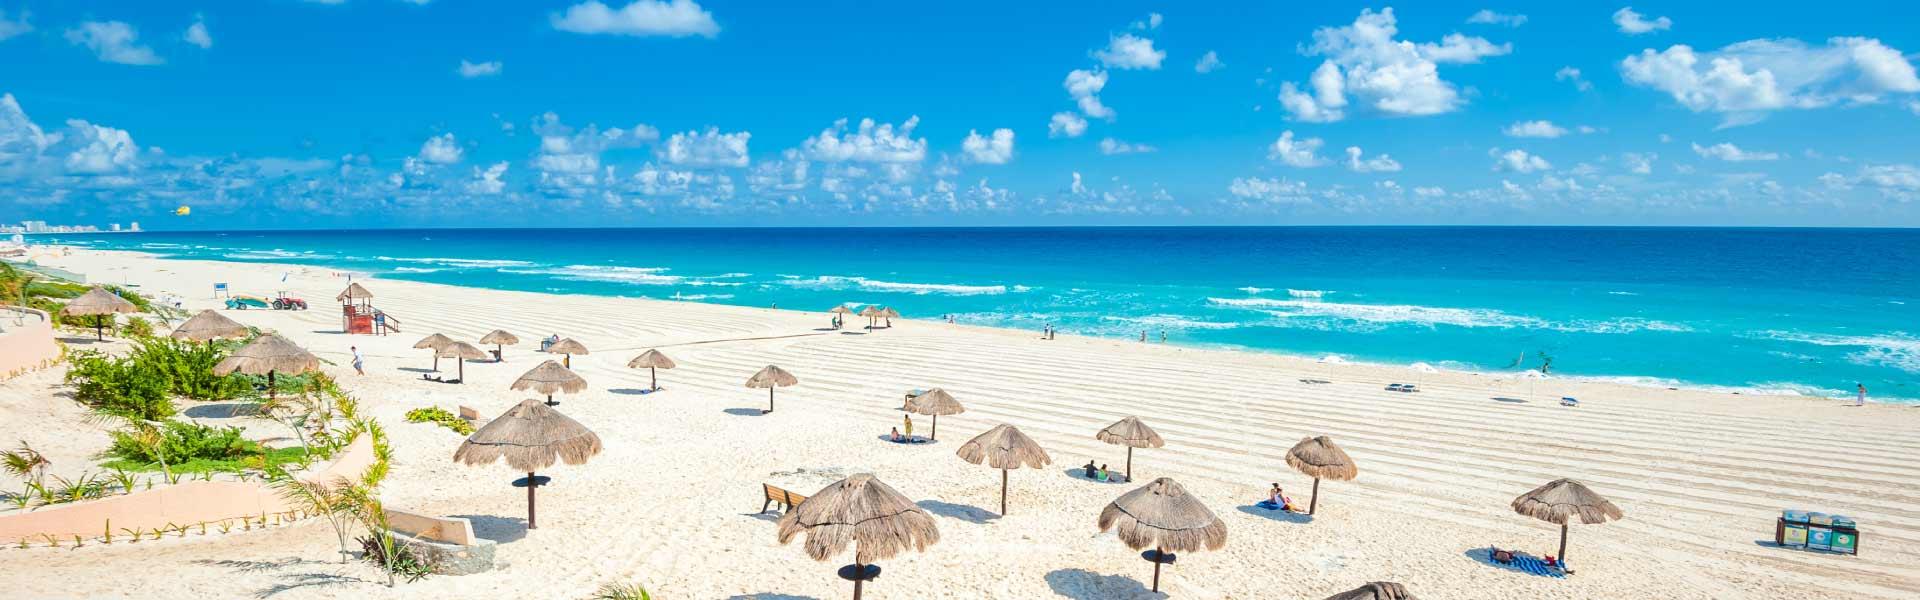 Paquetes todo incluido a Cancún